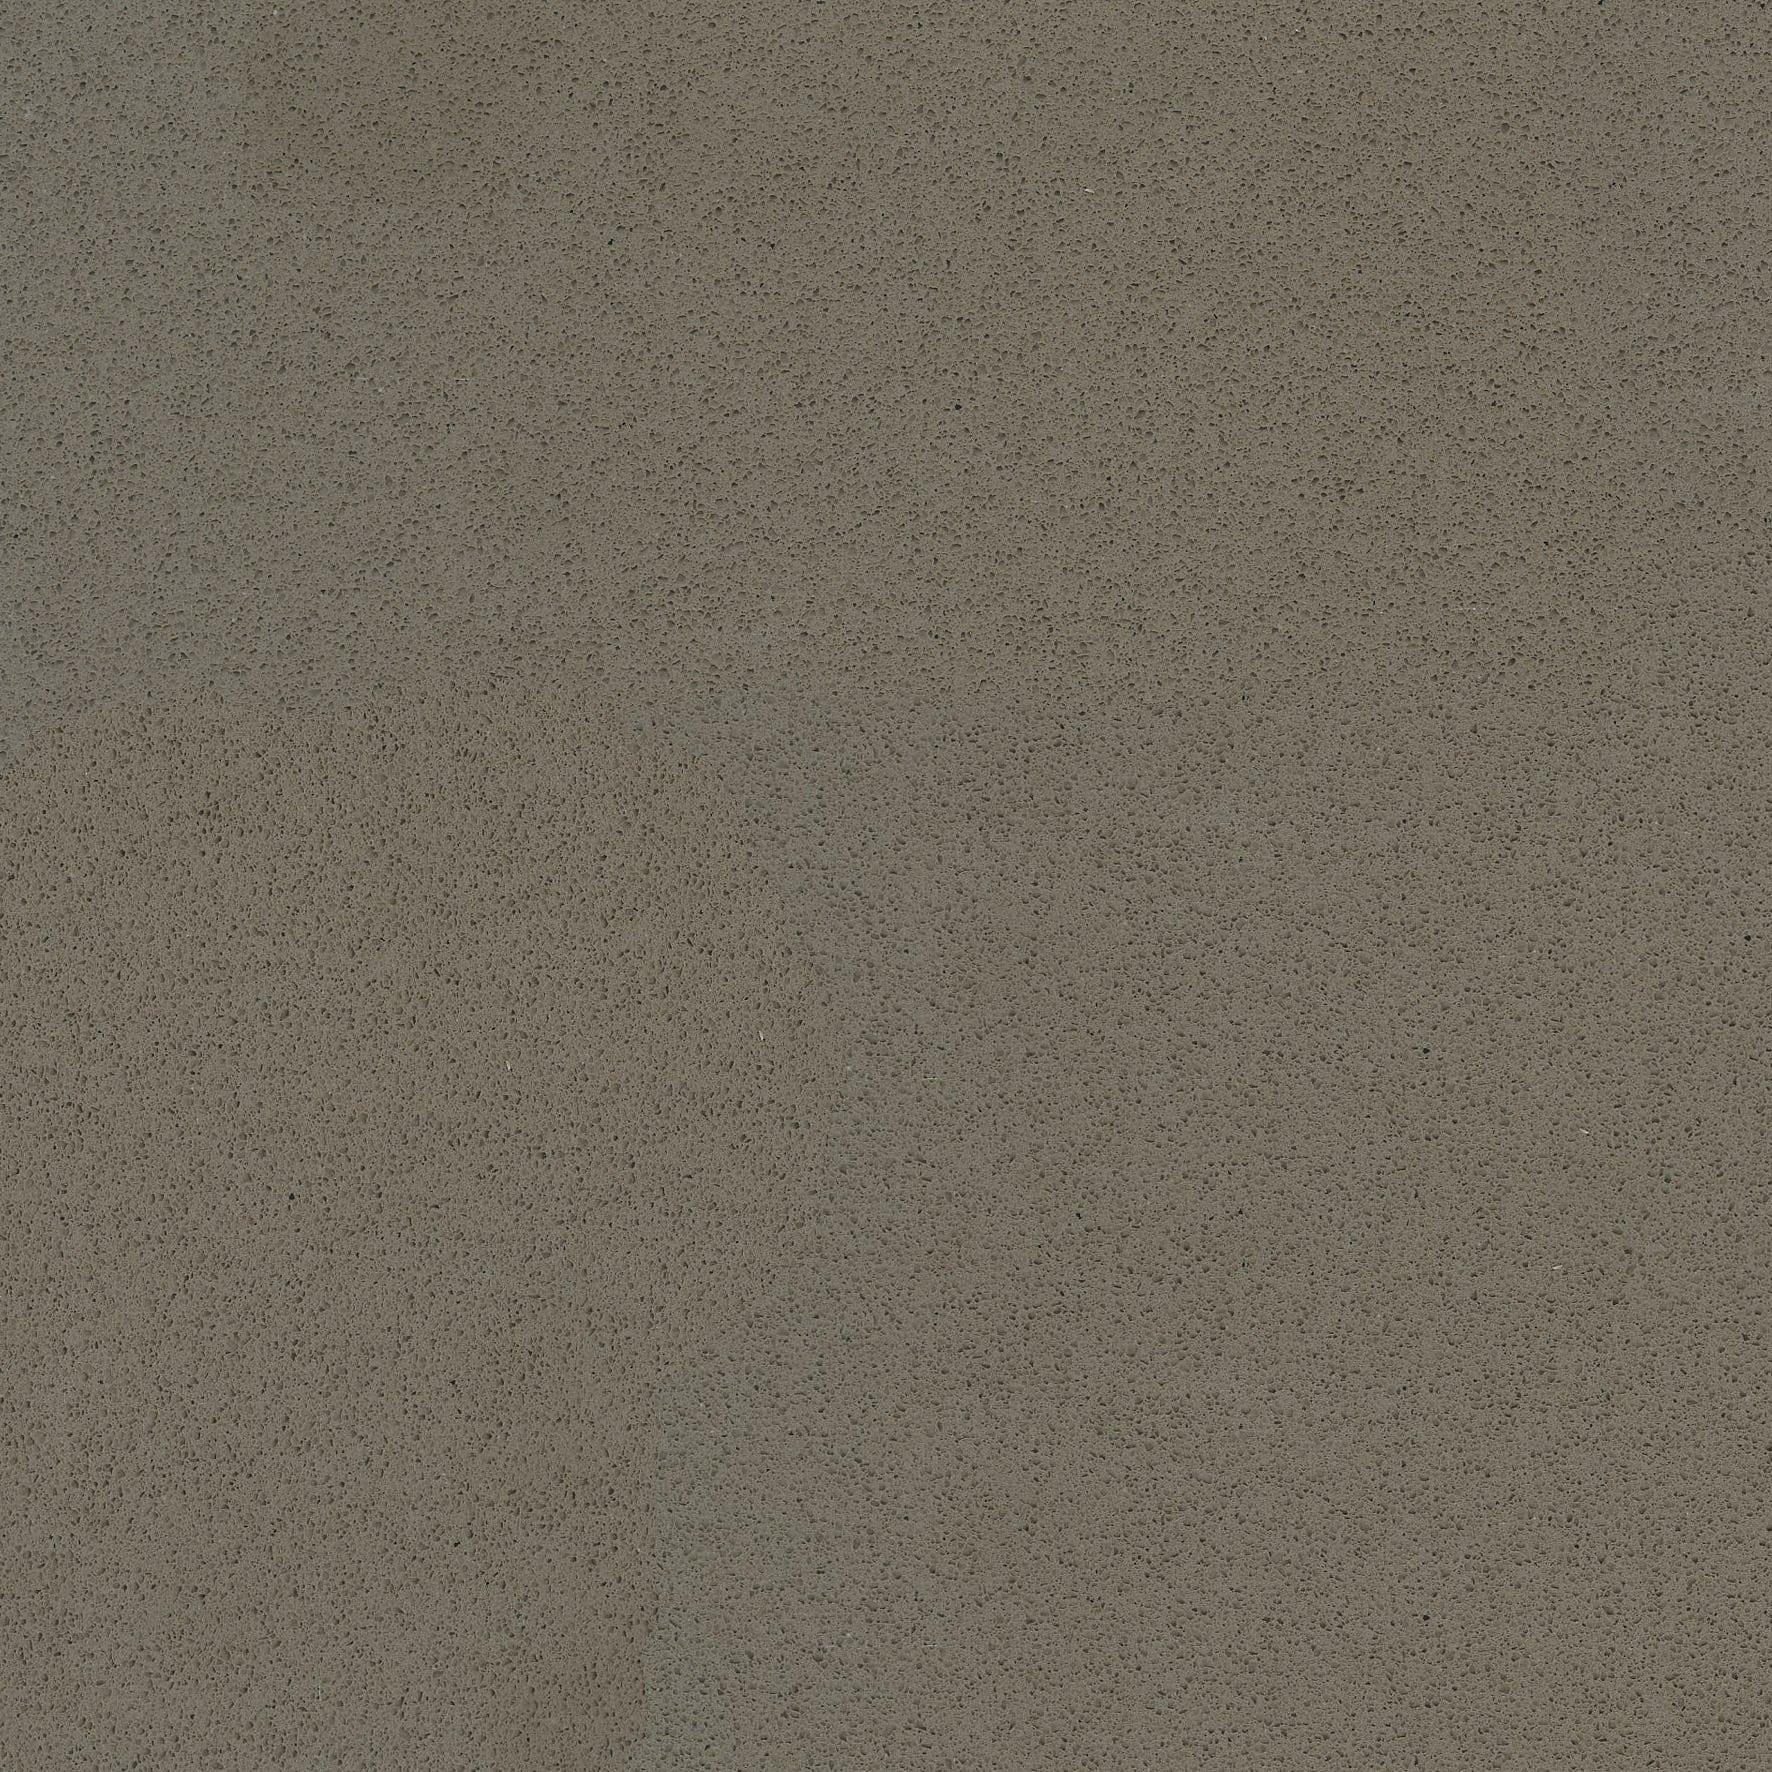 Noka florida granite for Stellar night quartz price